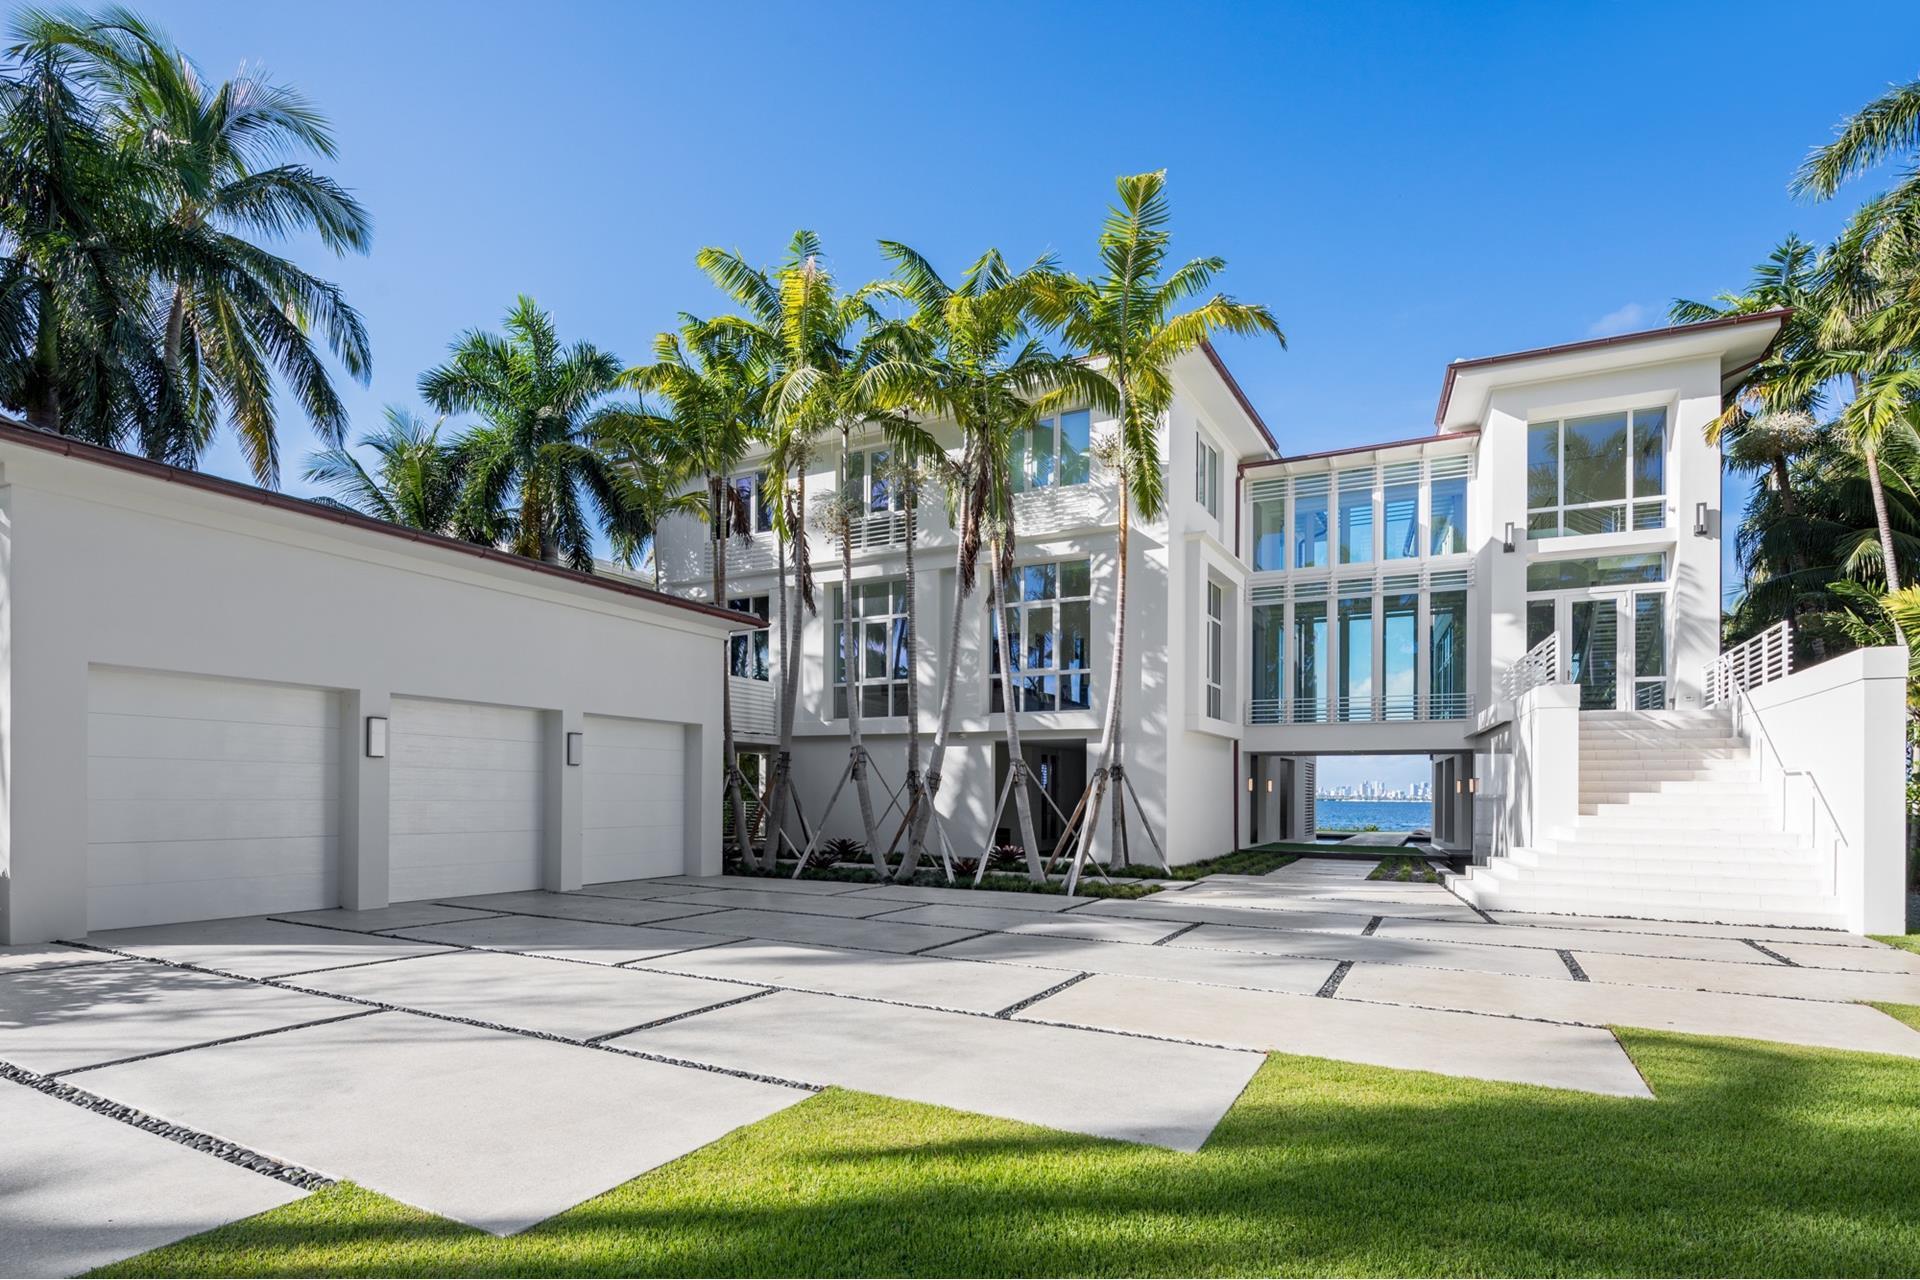 17 Tahiti Beach Island Rd - Coral Gables, Florida